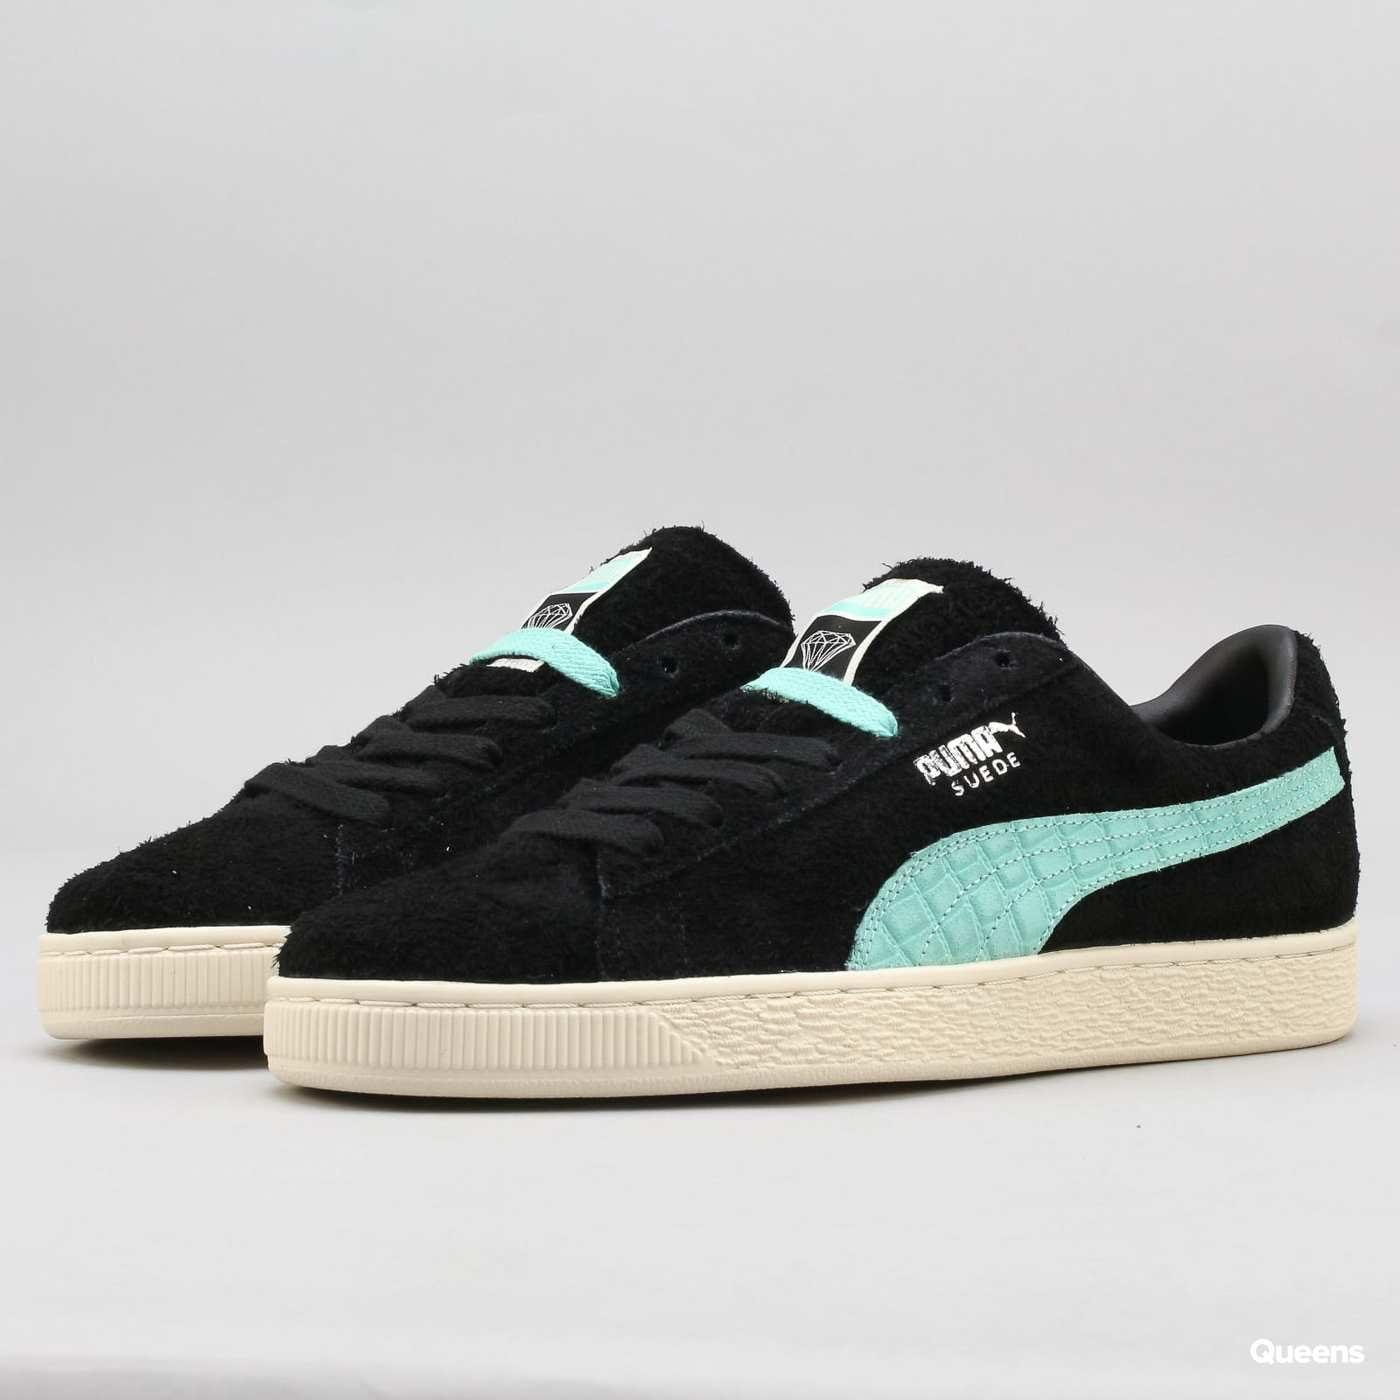 90e1998980b6 Sneakers Puma Suede Diamond (365650 01)– Queens 💚